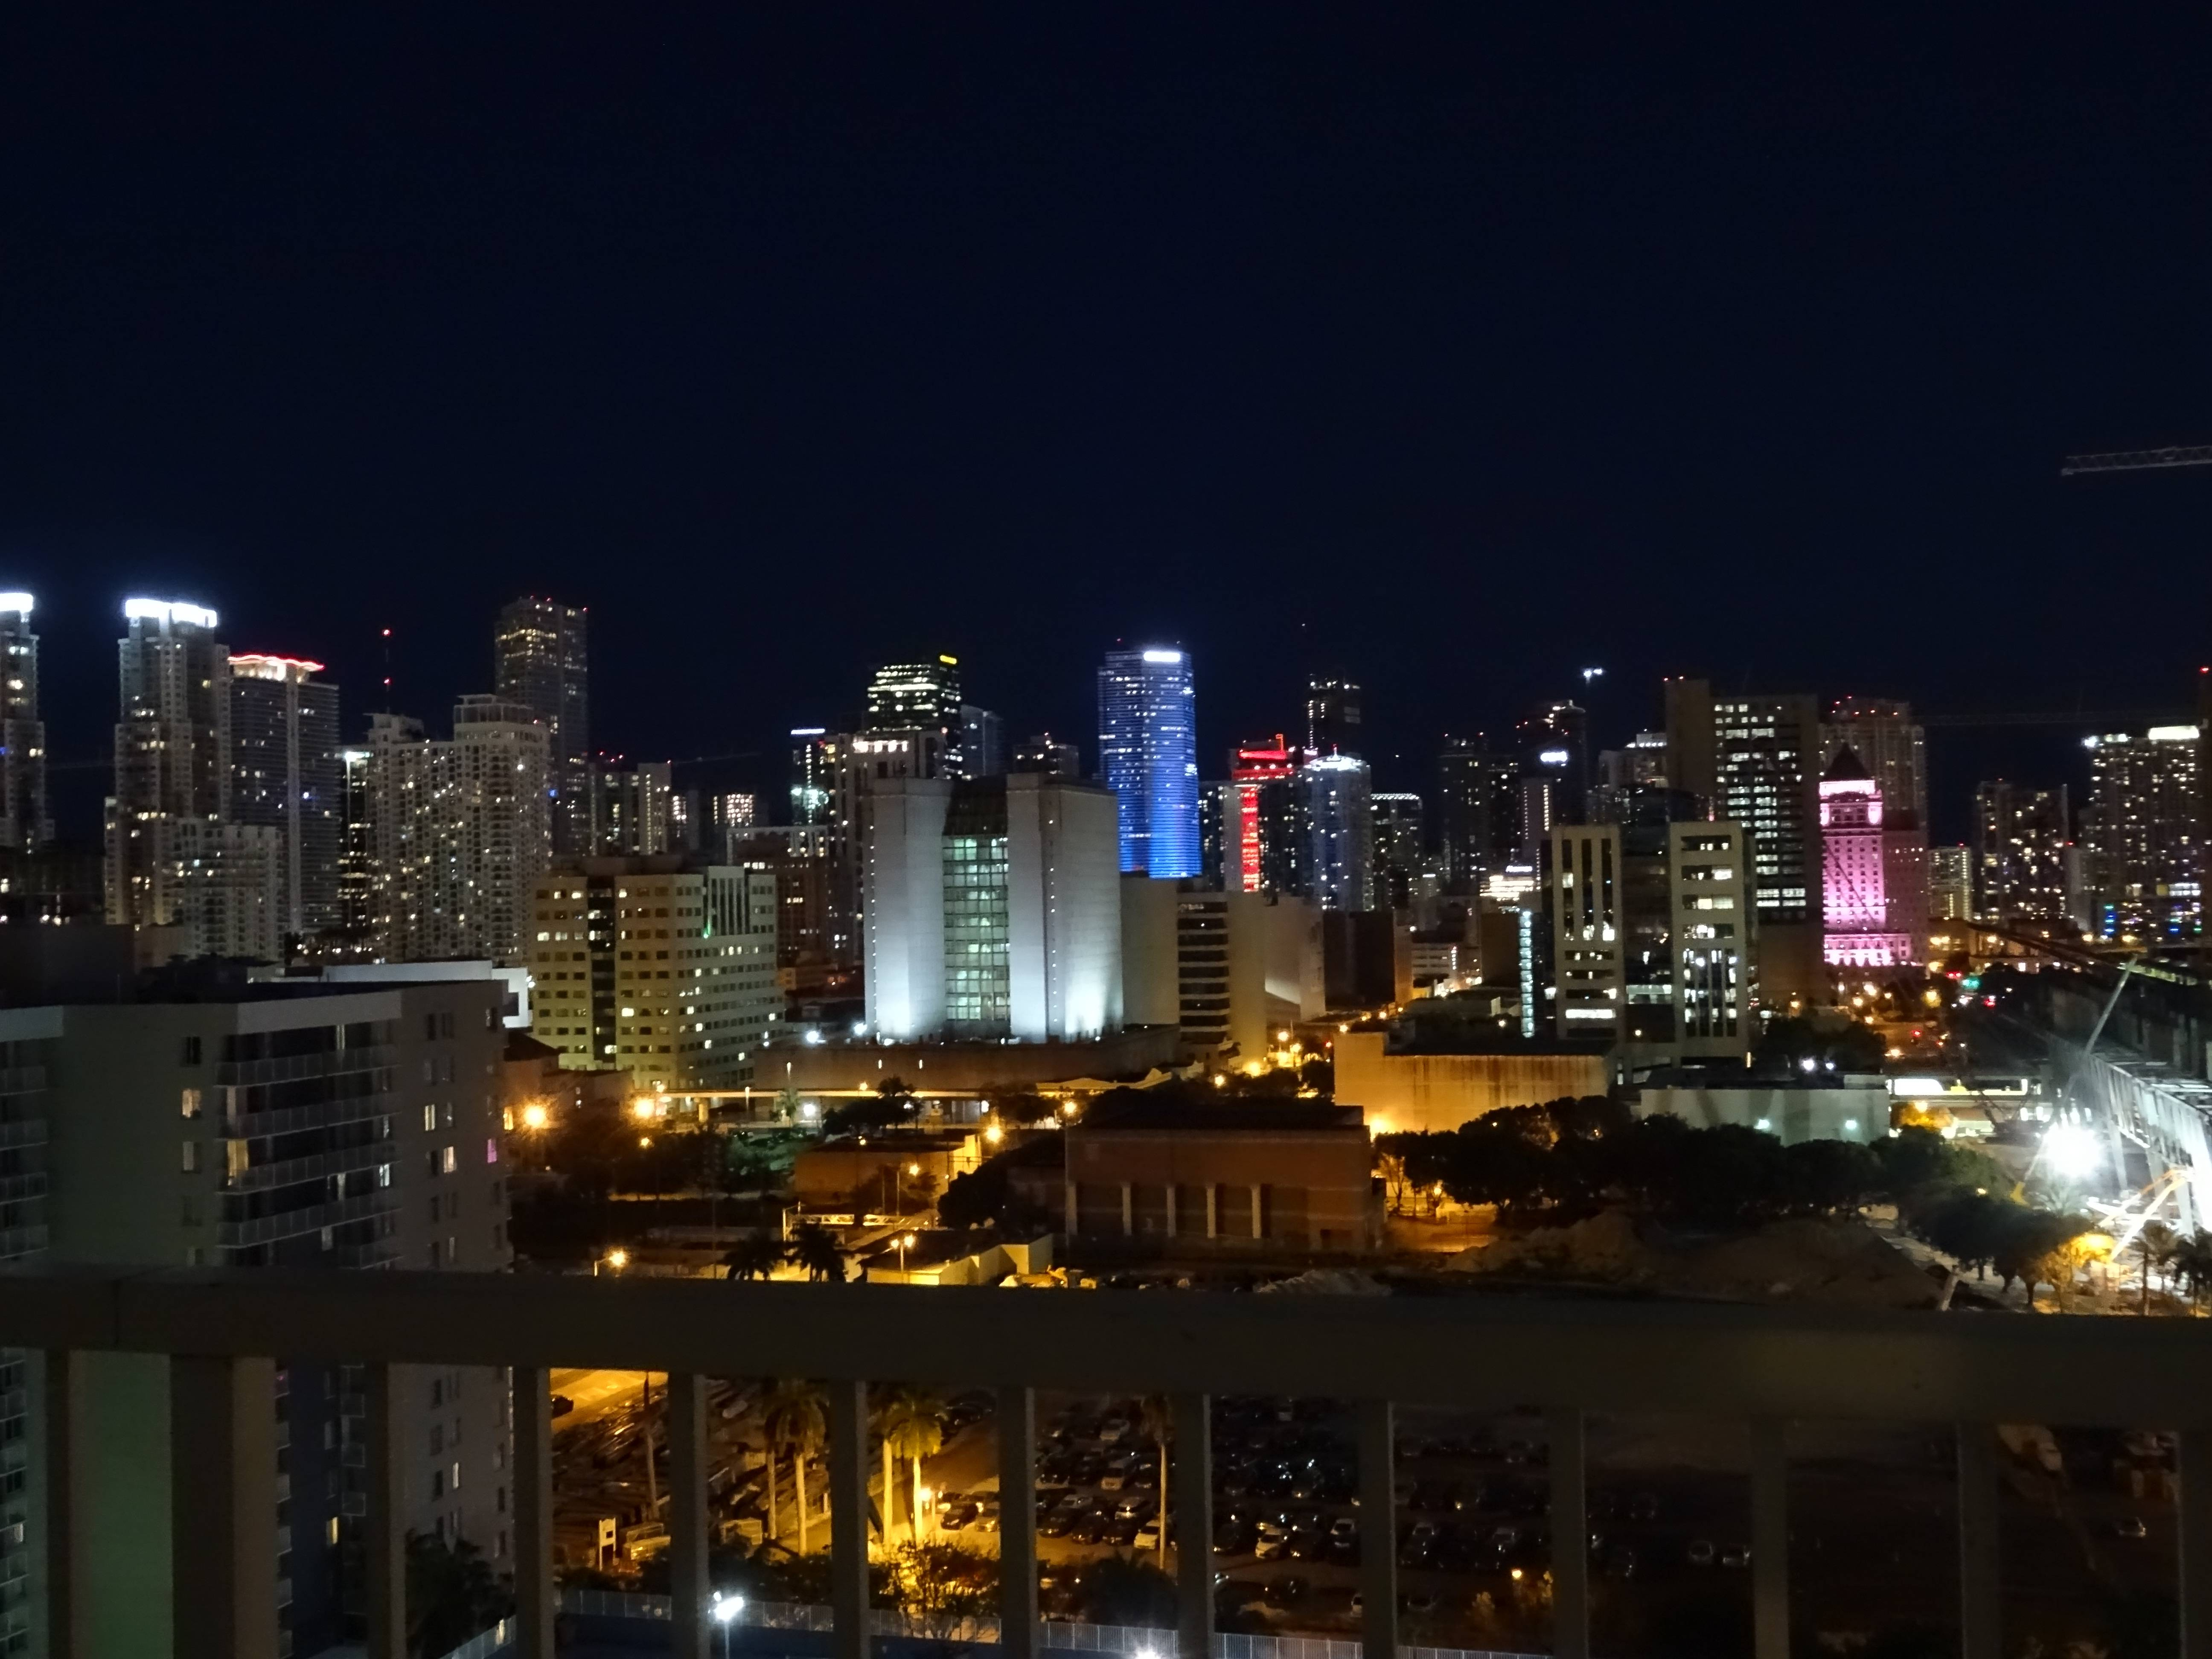 Photo 1: Miami entre copines